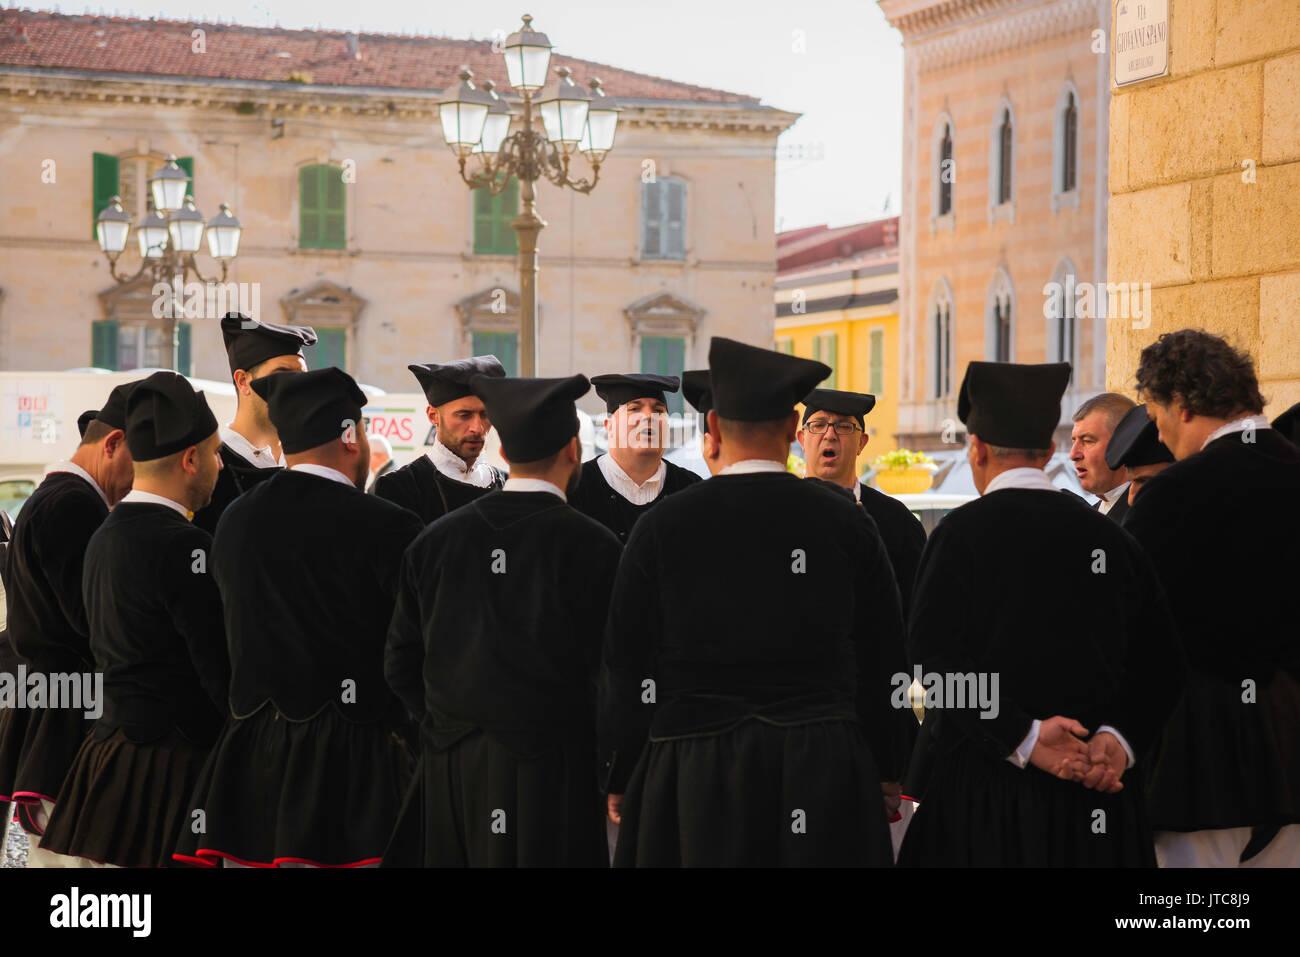 Sardinia folk music festival, a male choir practise in a Sassari side-street before performing in the La Cavalcata festival in Sardinia. - Stock Image